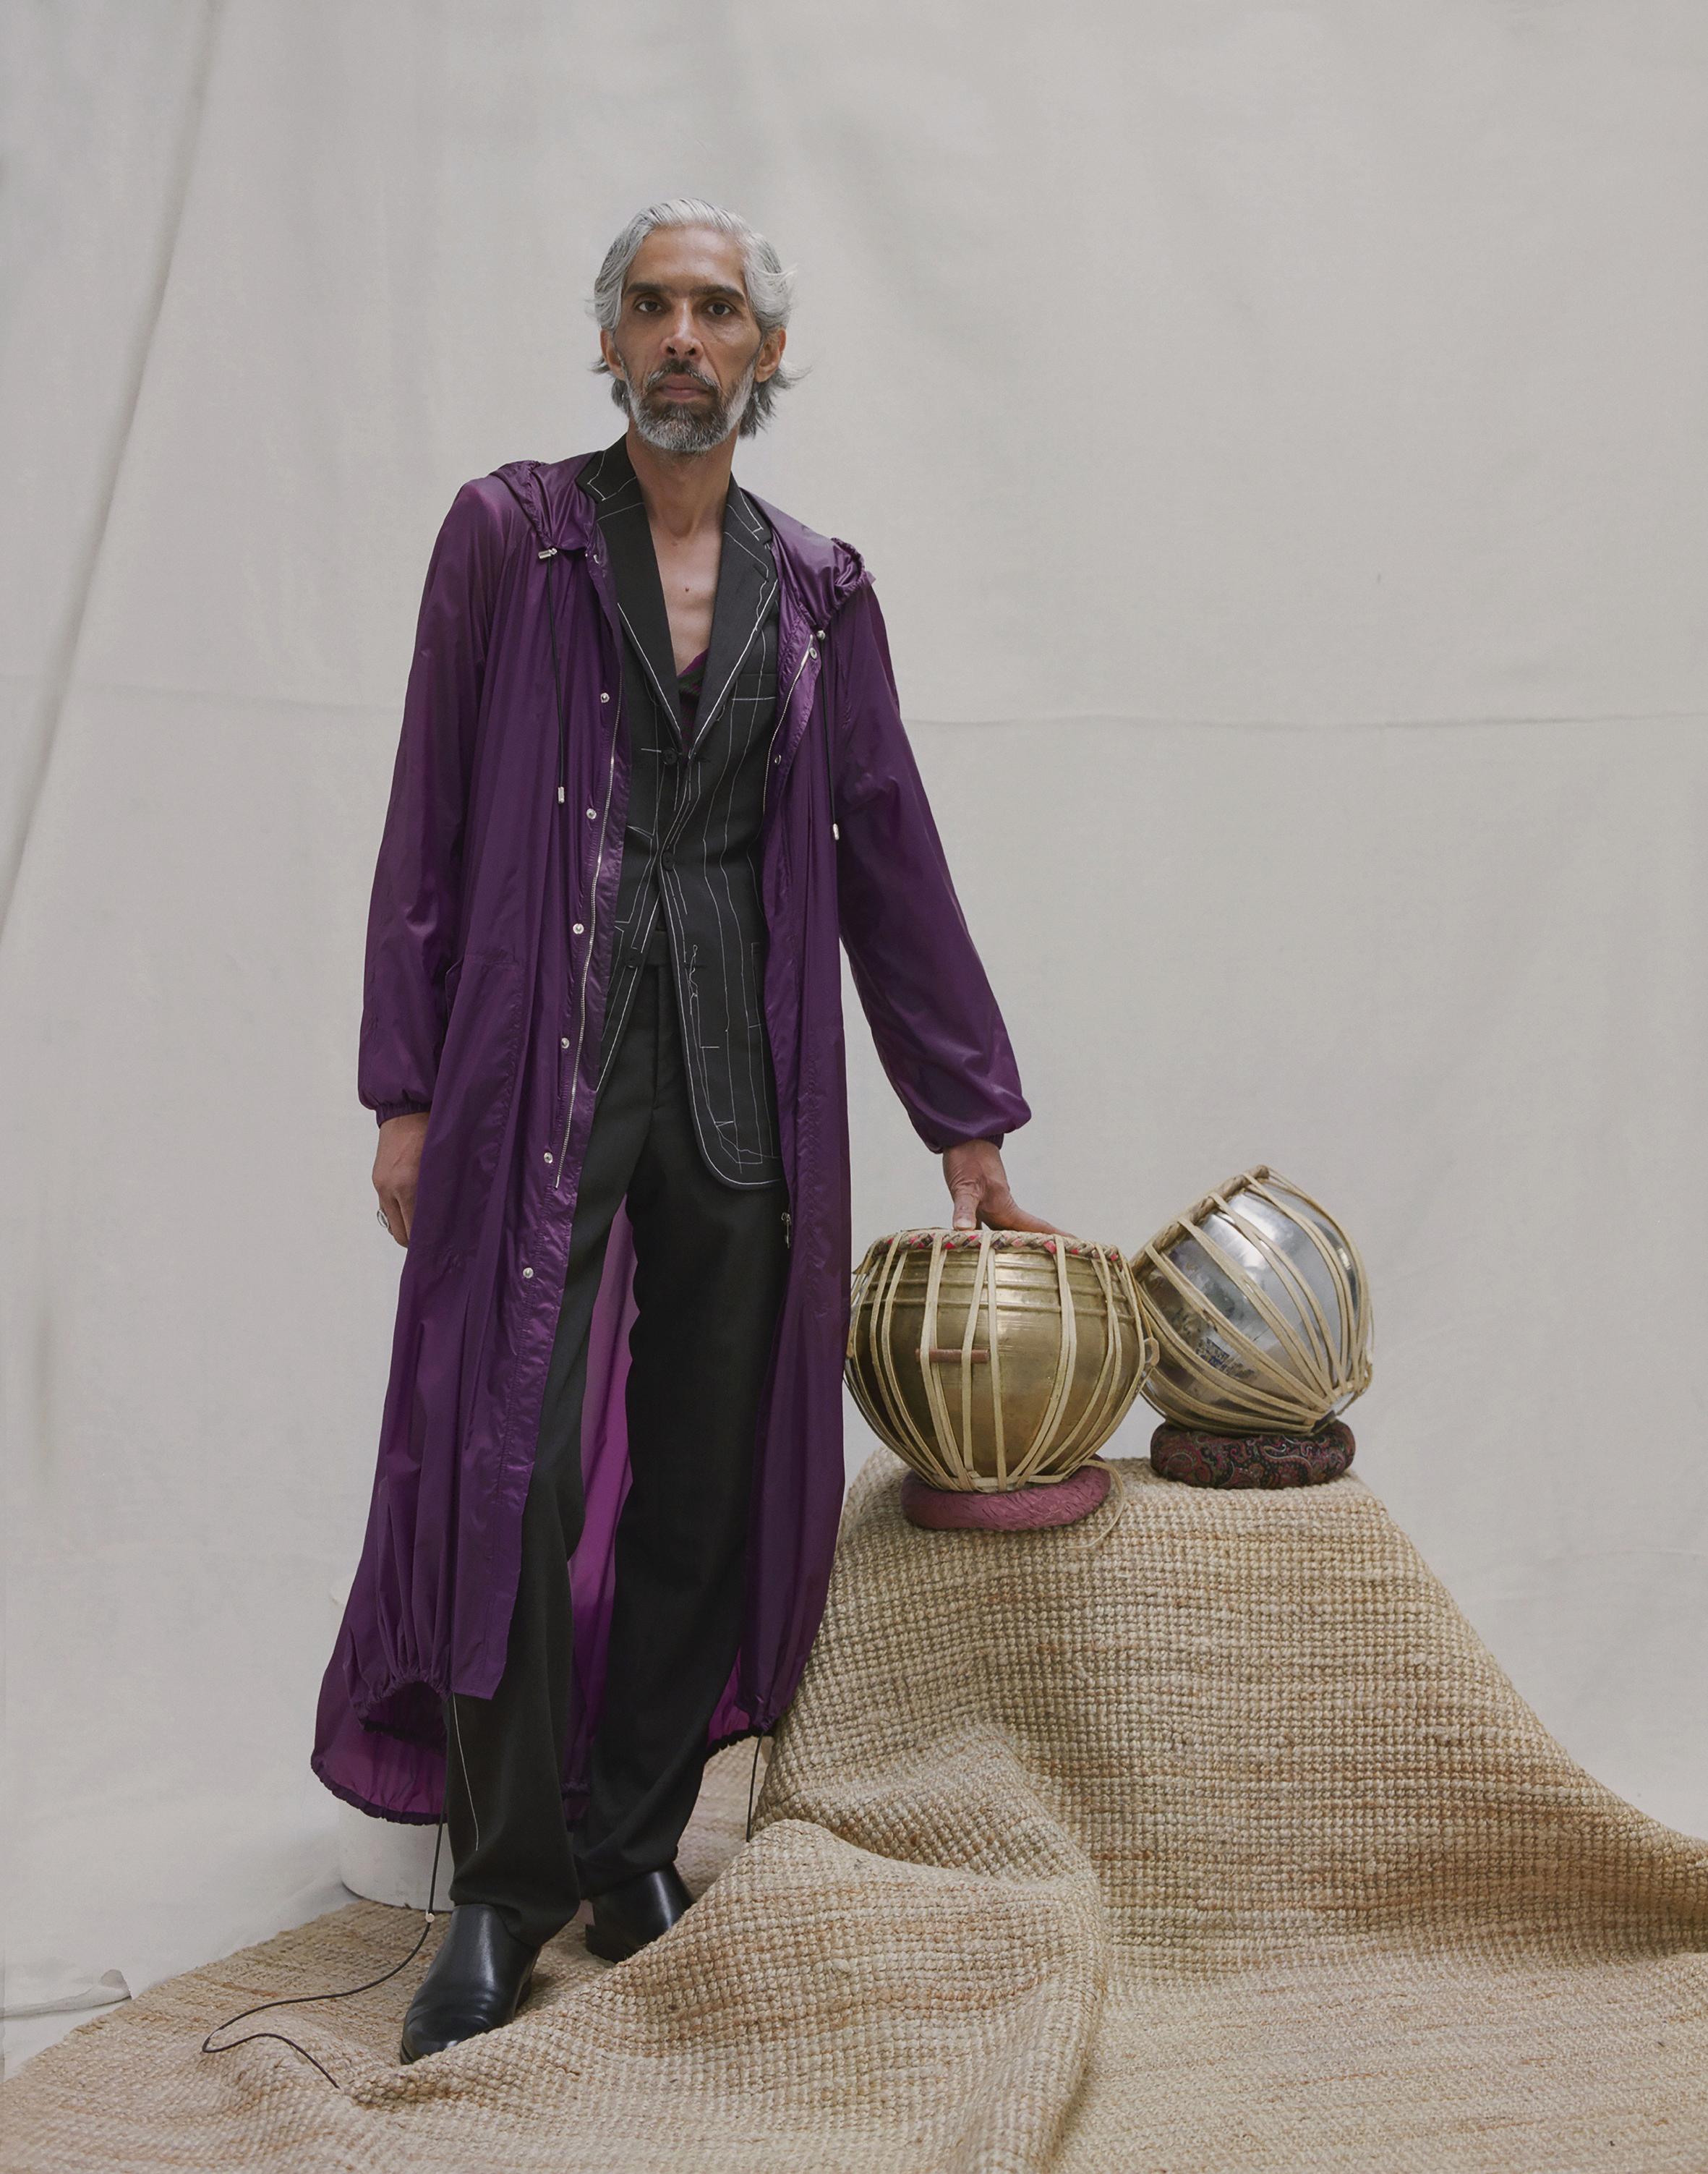 Outside stitched wool blazer and trousers MAISON MARGIELA,light nylon technical parka VERSACE.